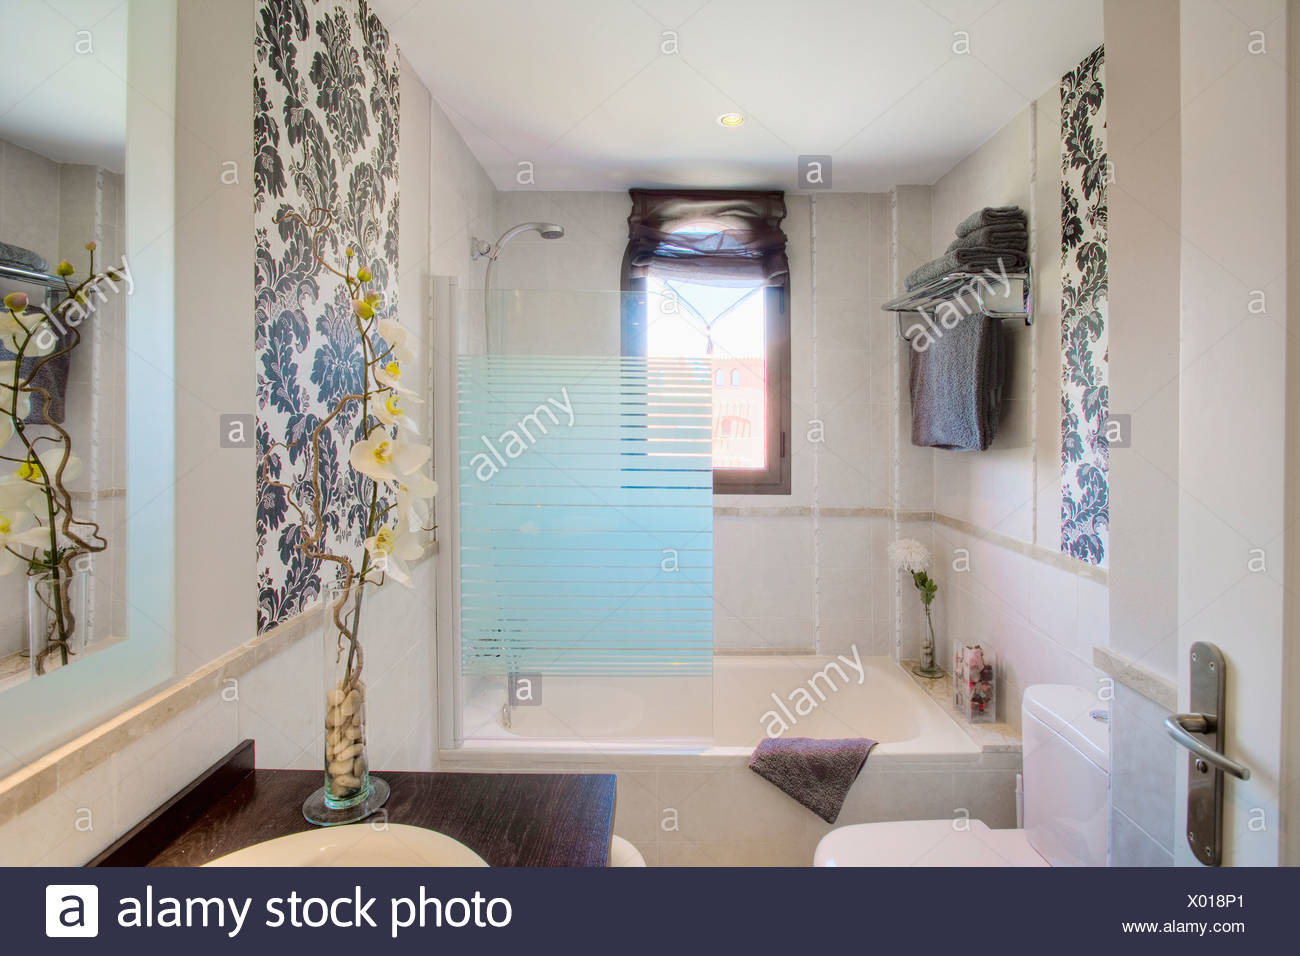 Vasca Da Bagno Moderno : Vasca da bagno moderna con mensole per camera d albergo idfdesign